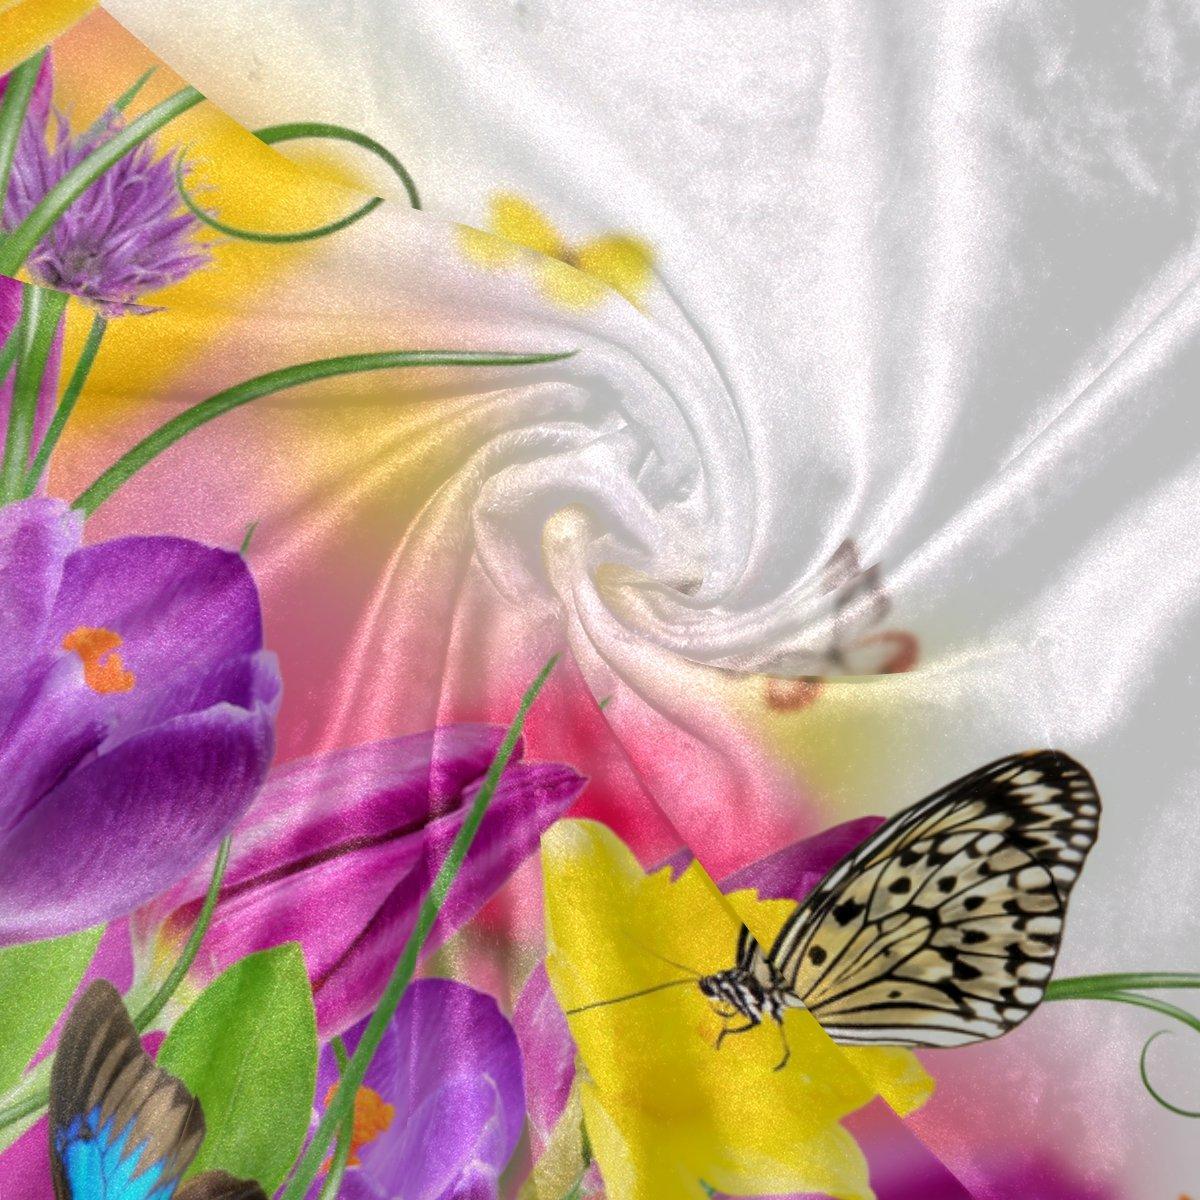 COOSUN Flowers Daffodils Butterflies Butterflies Butterflies Super Soft Warm Blanket Lightweight Throw Blankets for Bed Couch Sofa Travelling Camping 90 x 60 Inch for Kids Boys Girls B0789BDLRR Kopfkissenbezüge 782569